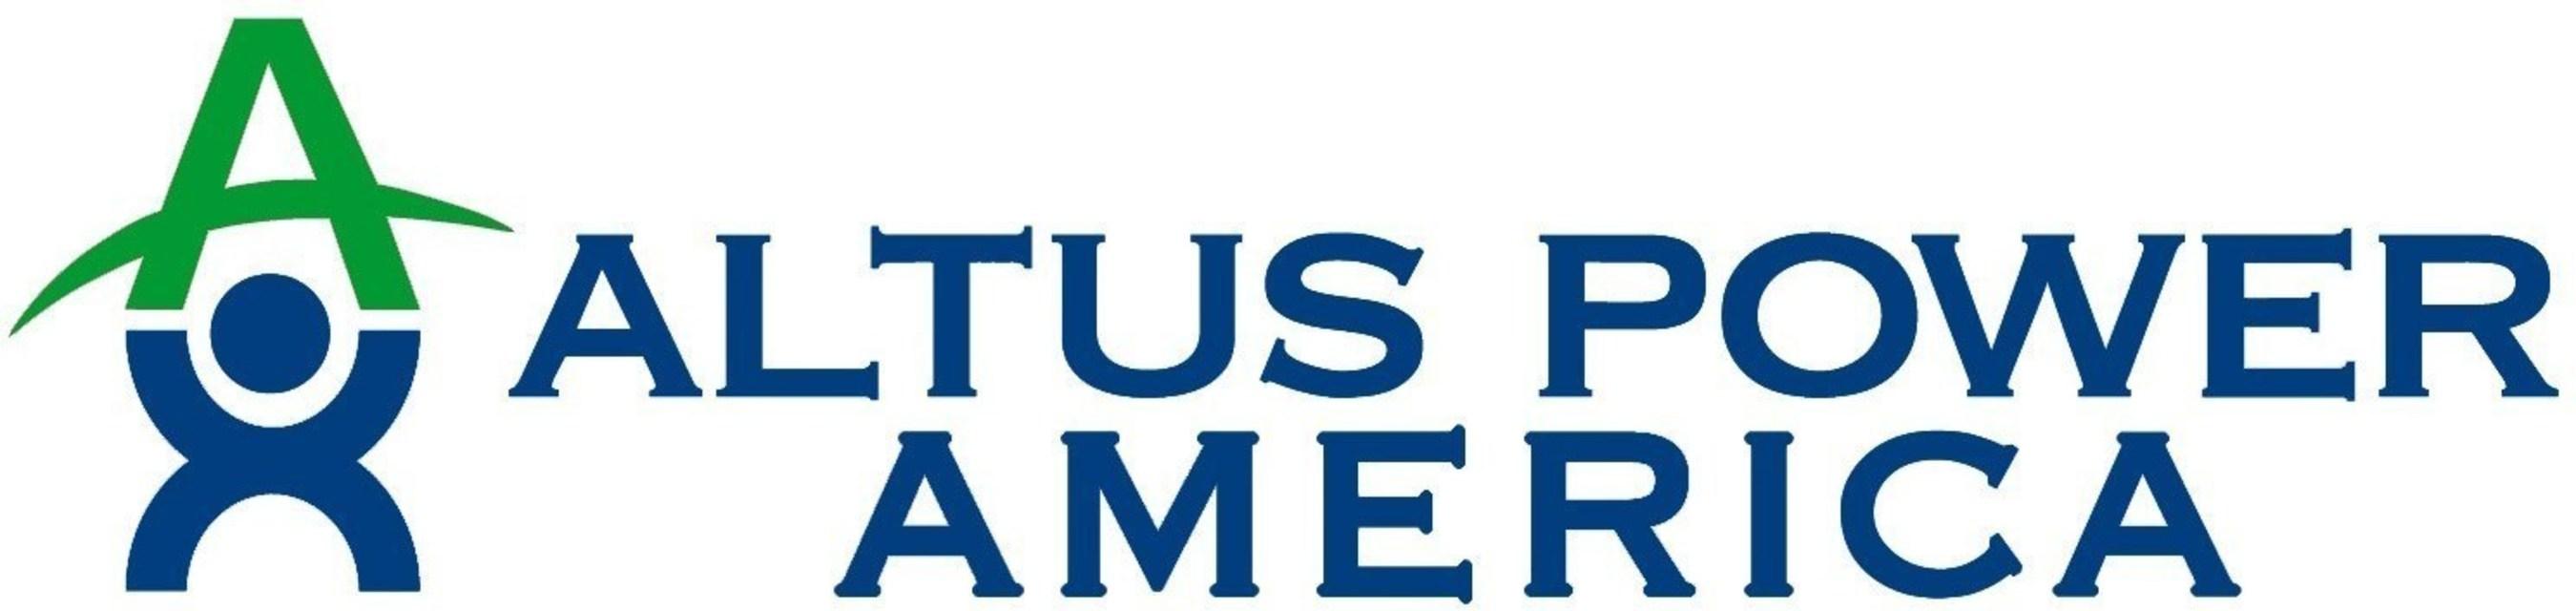 Altus Power Begins Providing Clean Energy to Georgia Power from Newington Solar System